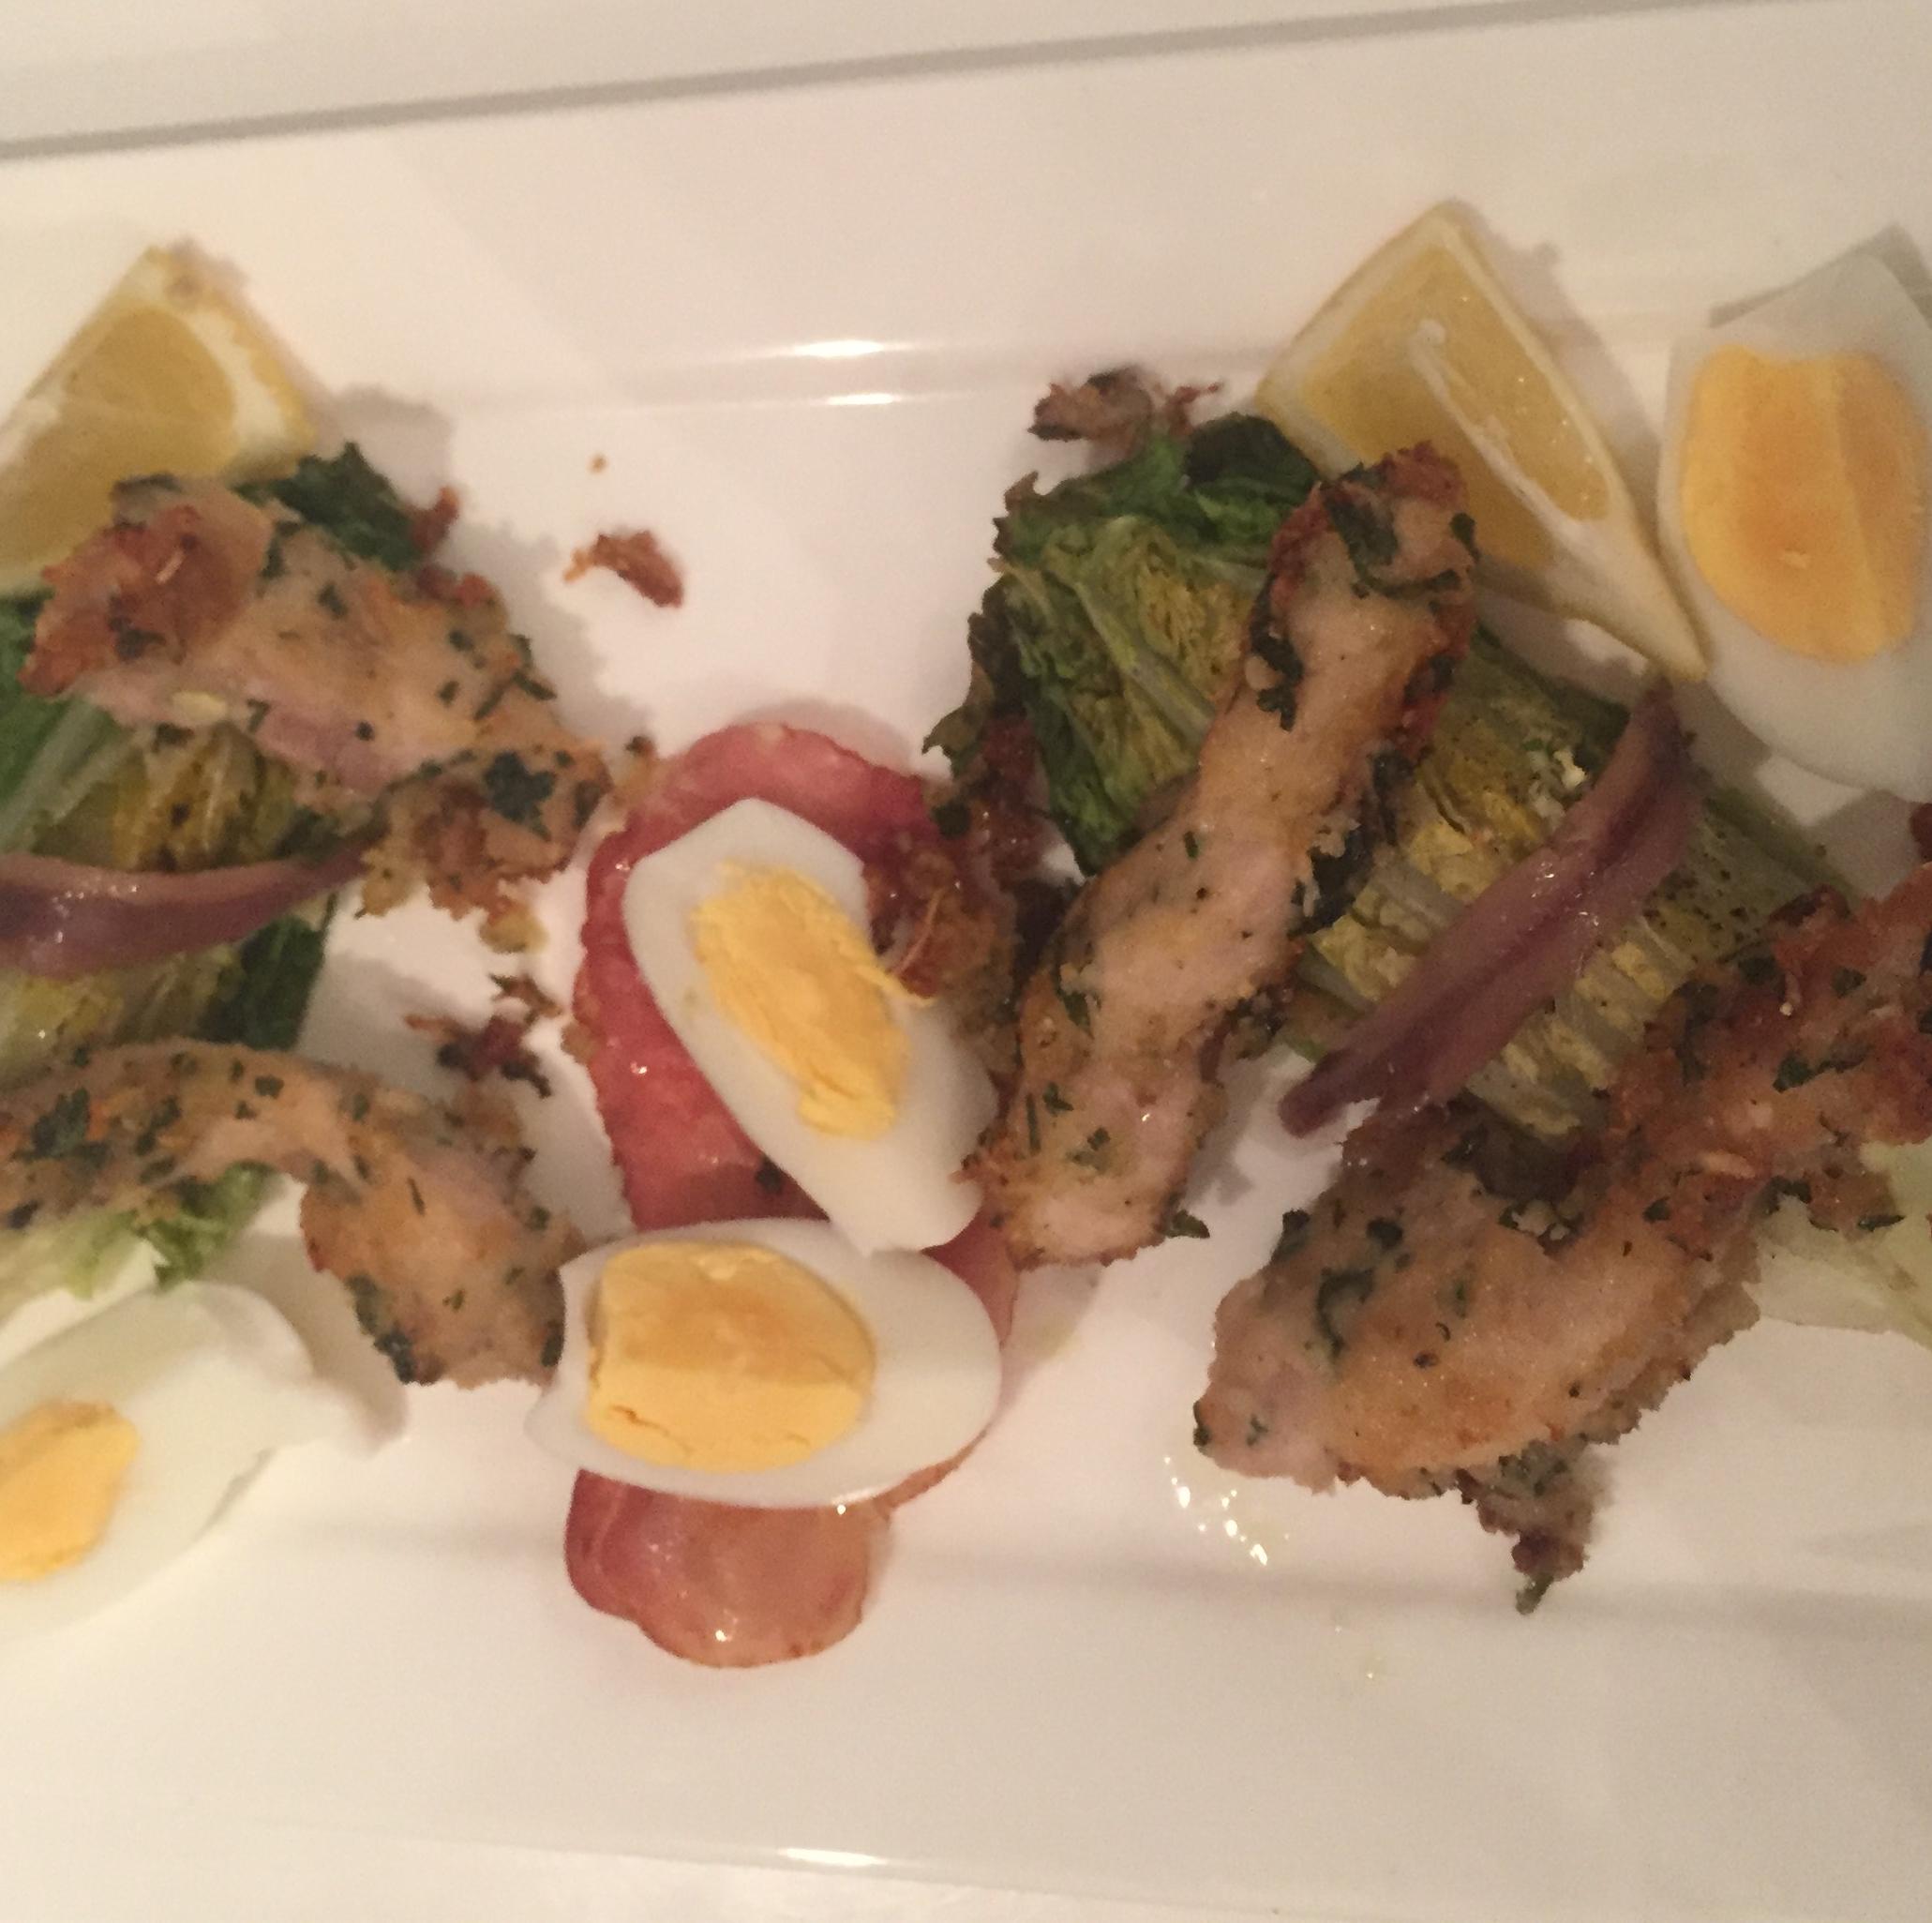 Warme ceasarsalade met kip, eieren, ansjovis en Romaine sla